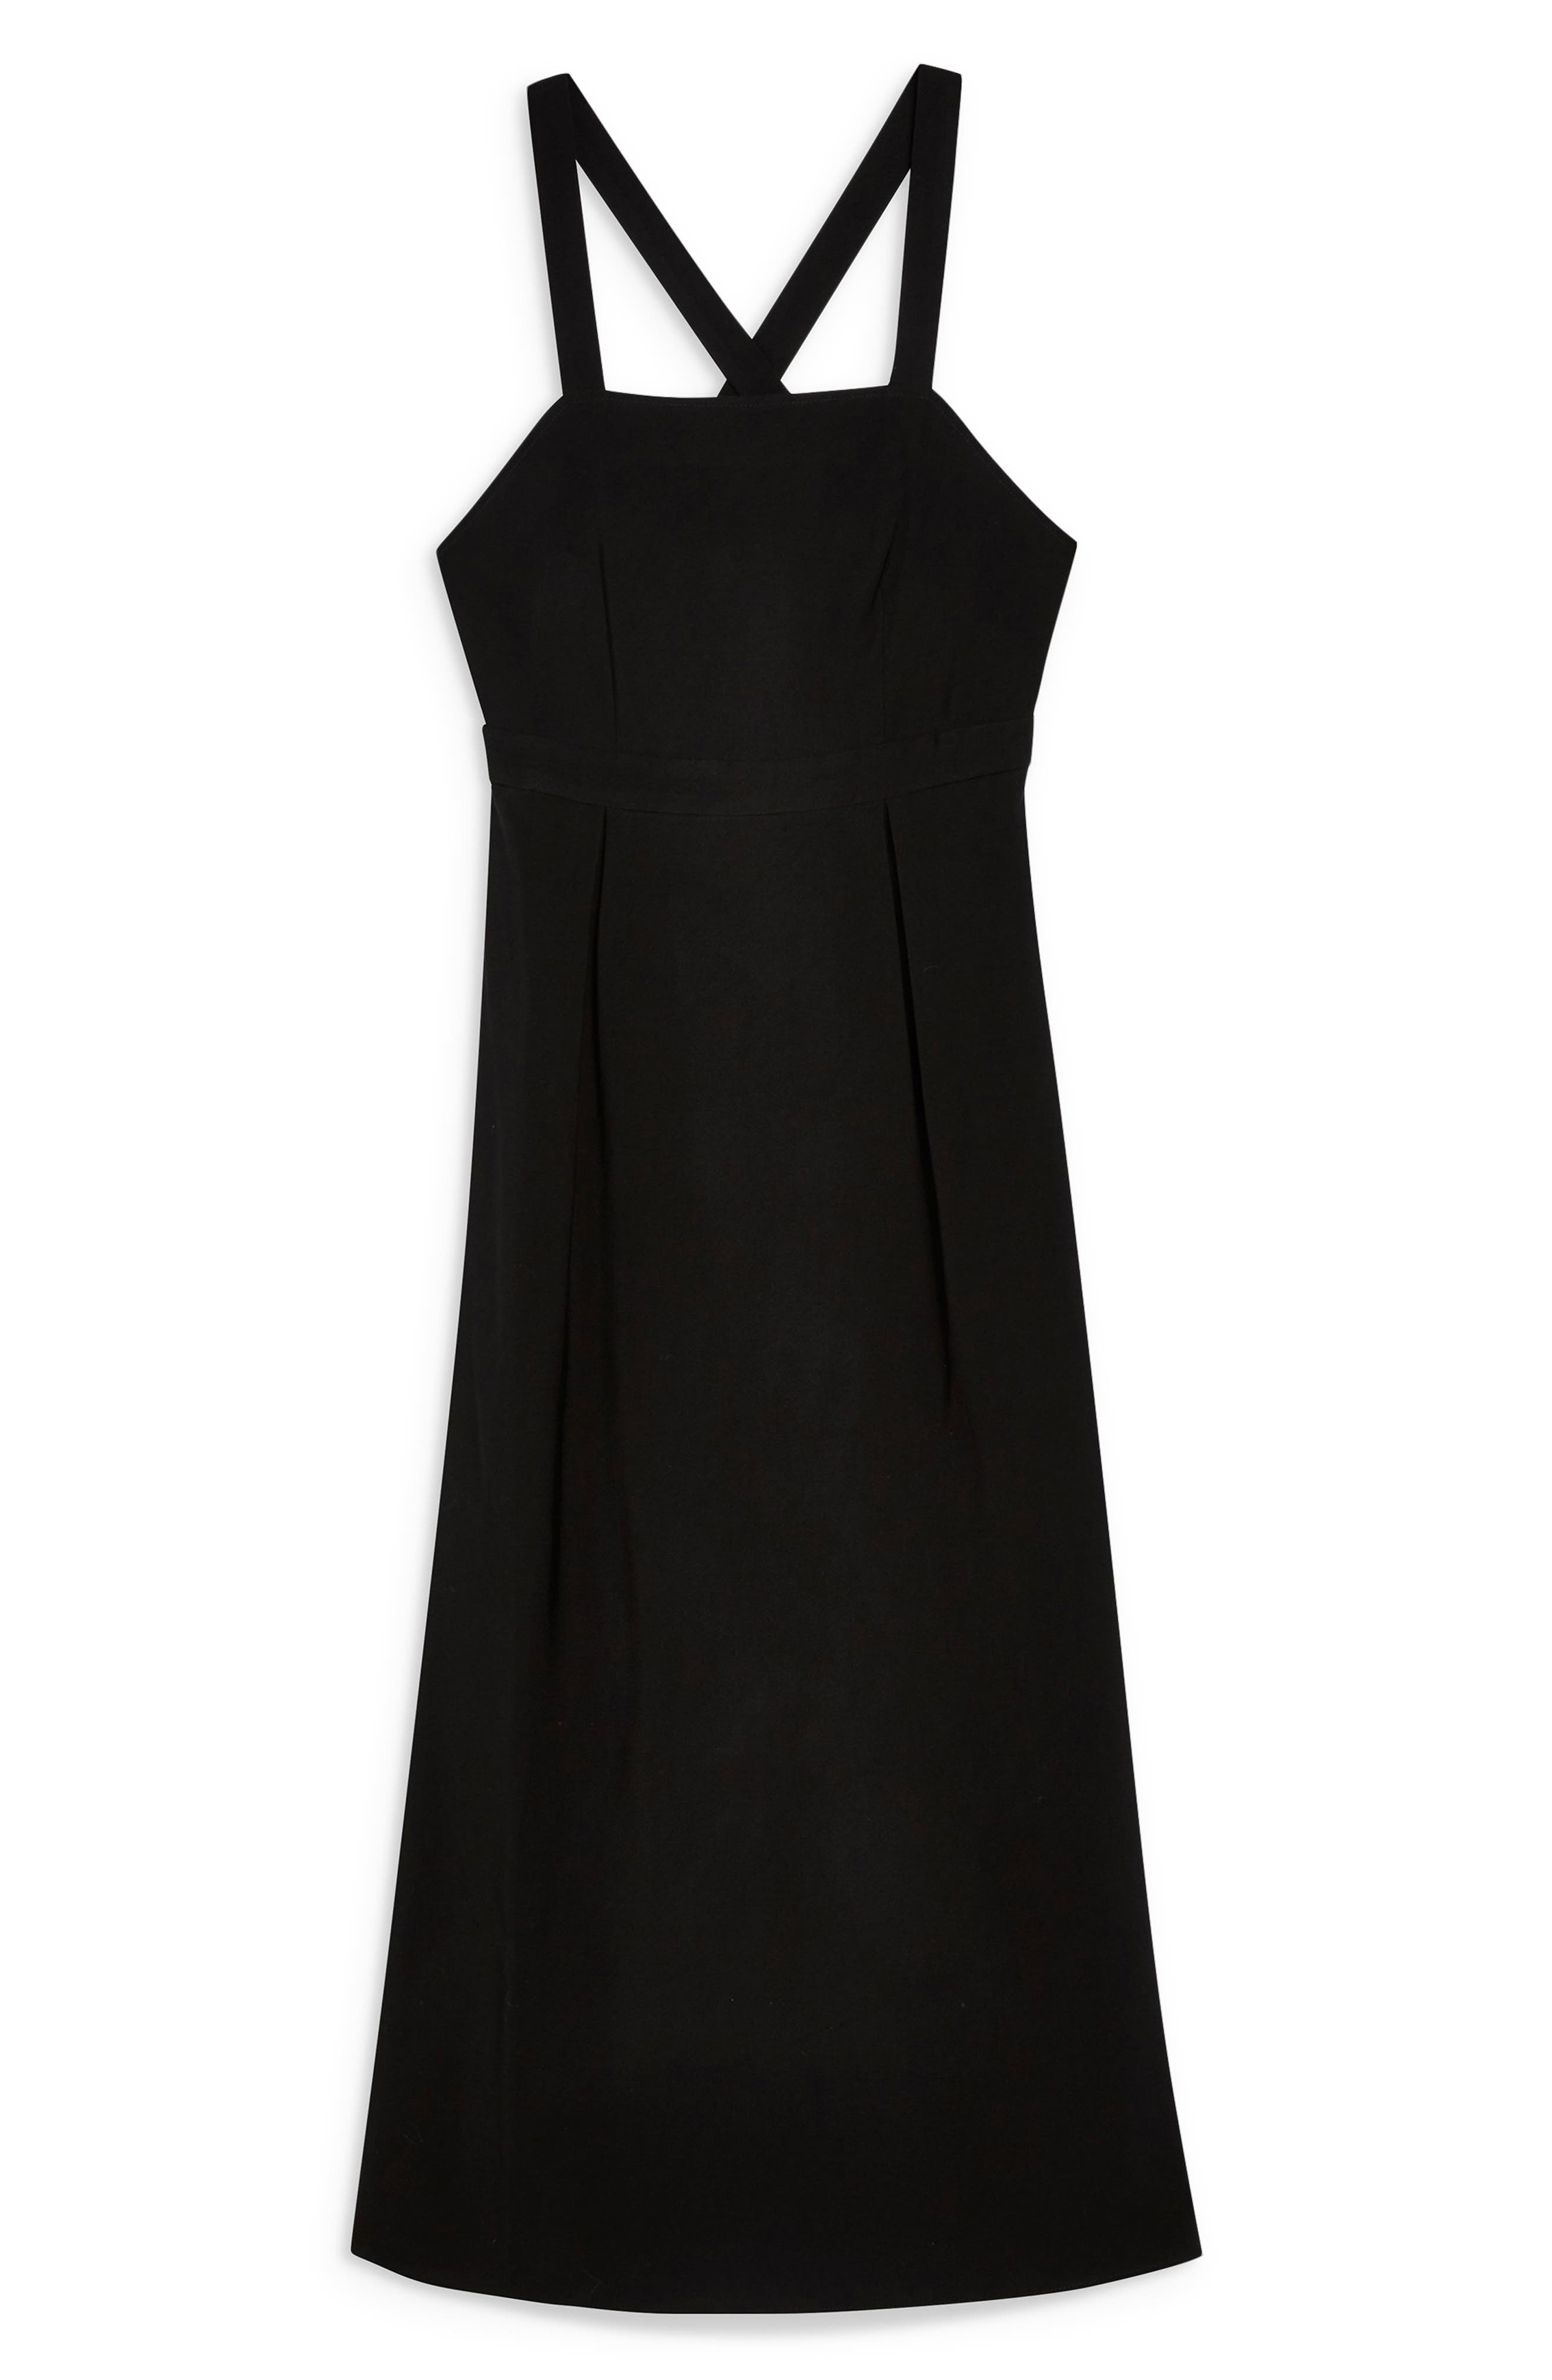 TOPSHOP, Tilda Pinafore Midi Dress, Alternate thumbnail 3, color, BLACK